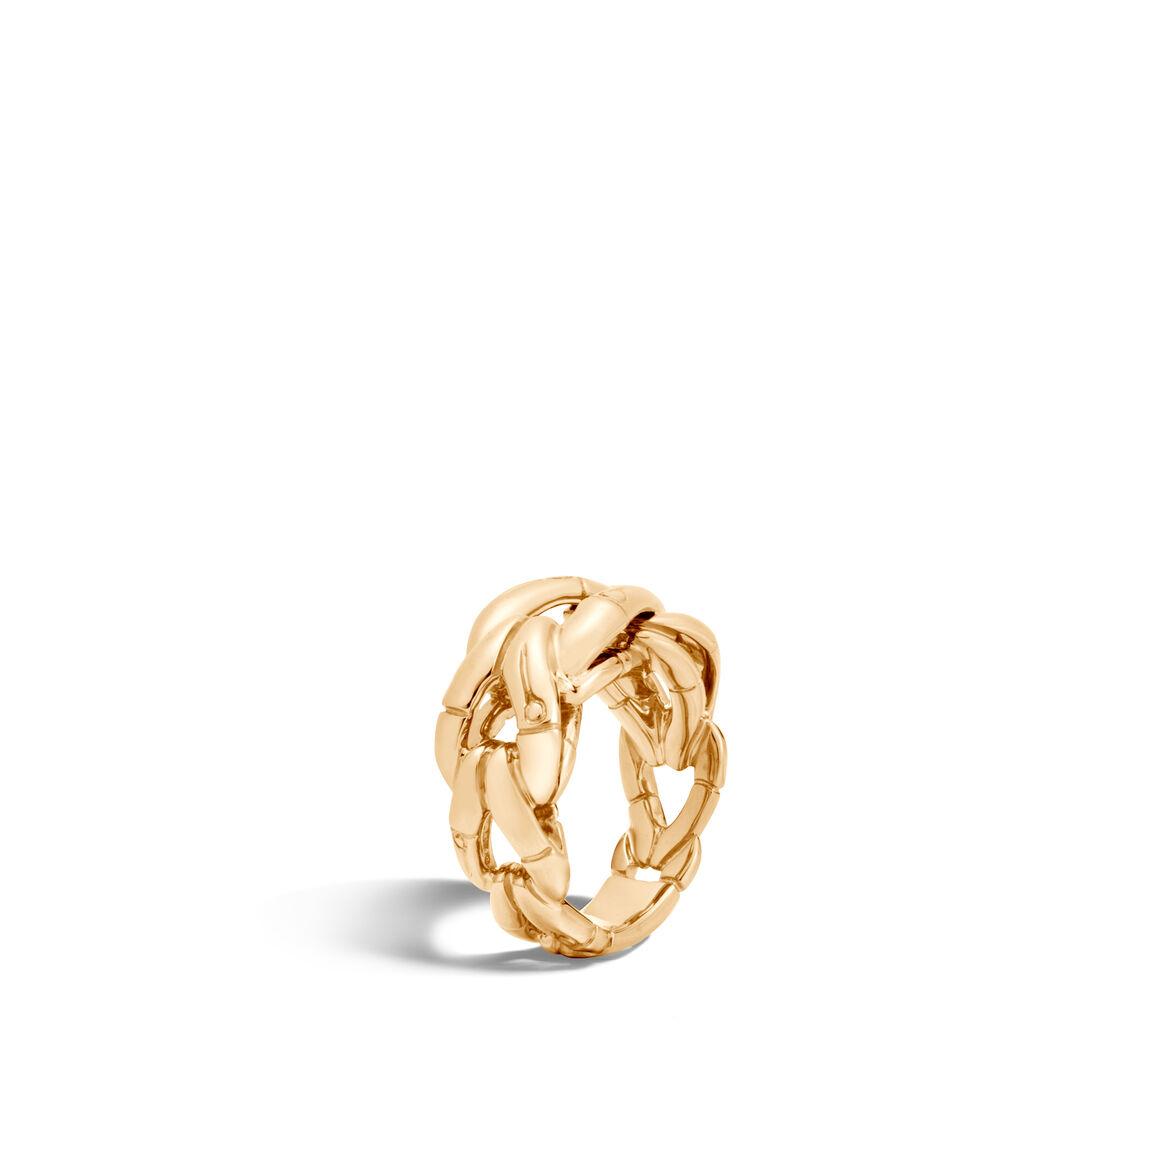 Bamboo Ring in 18K Gold